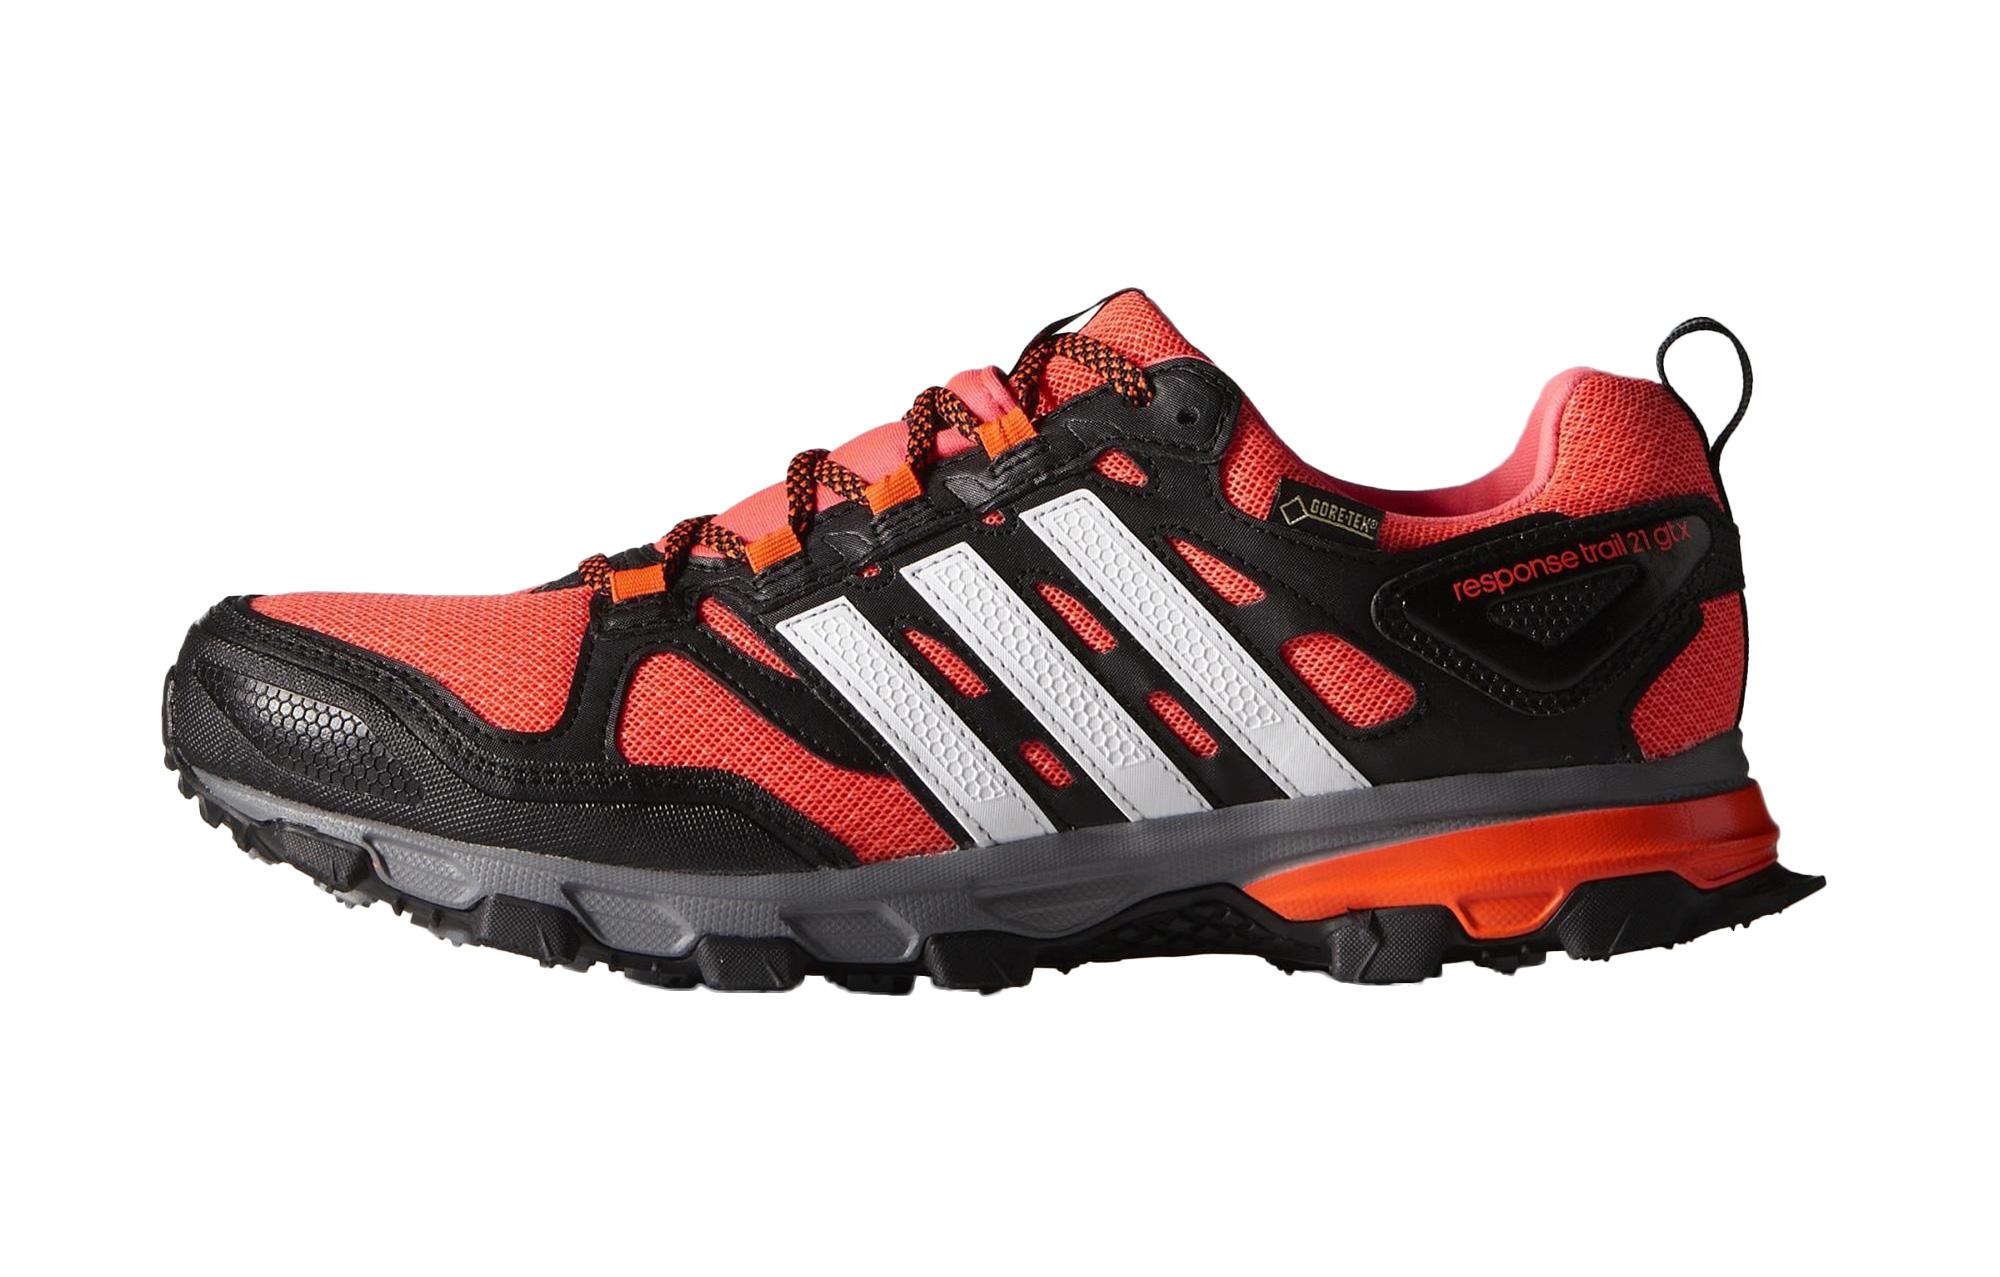 adidas Response Trail 21 GTX |